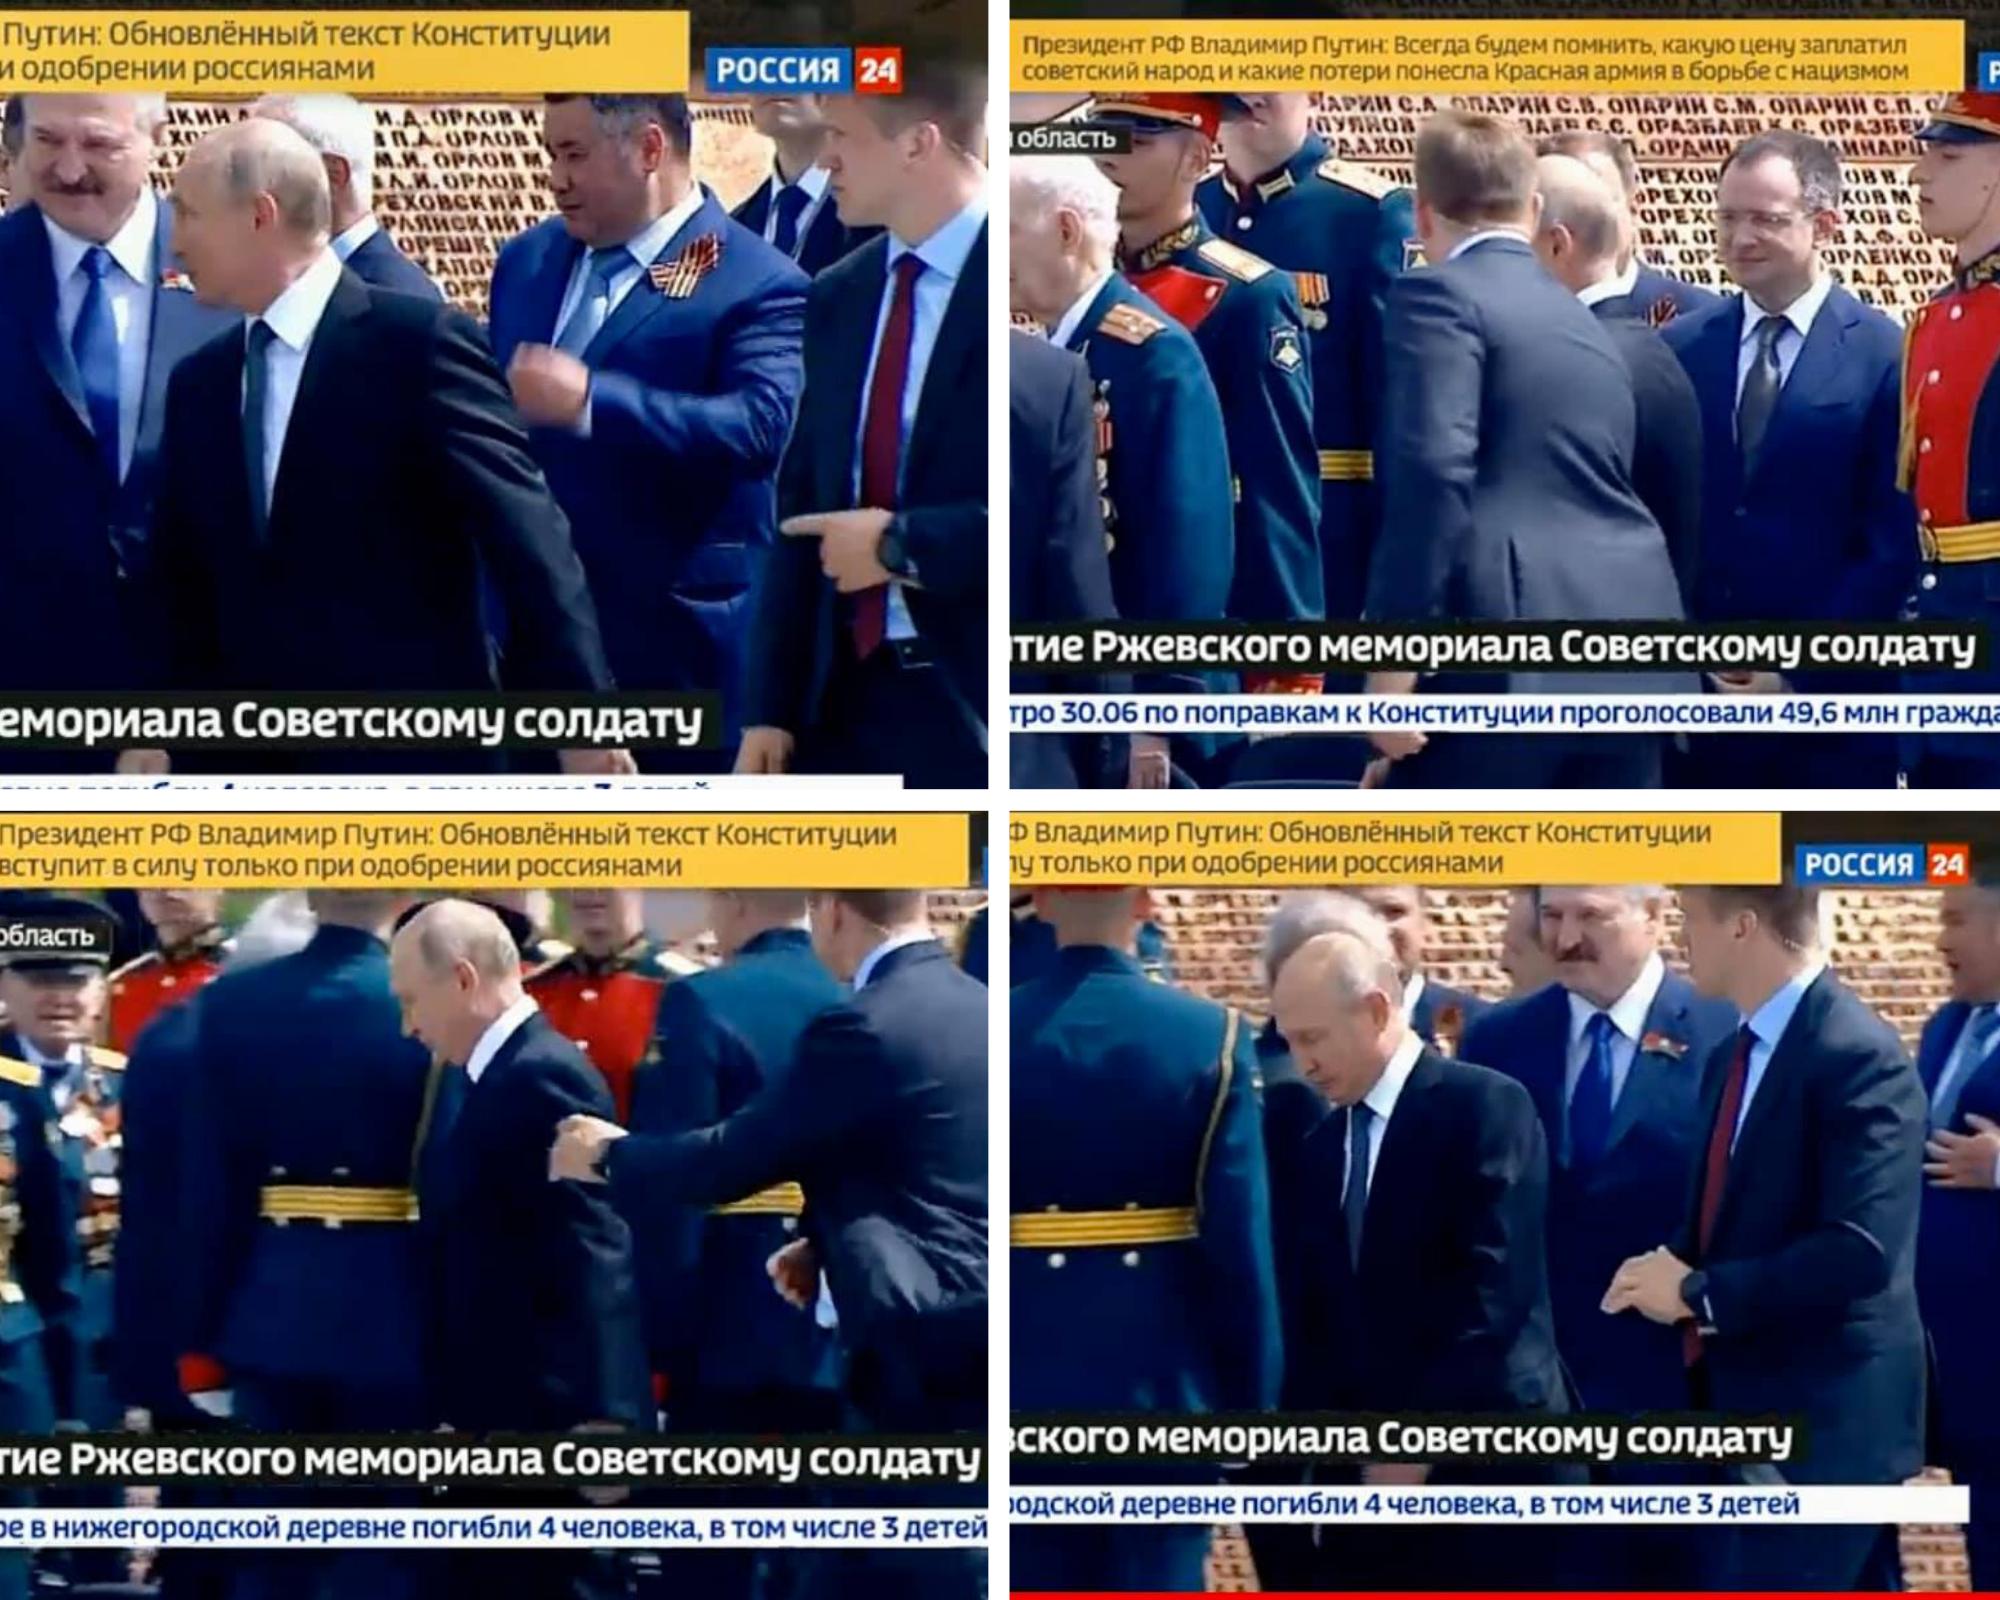 Скриншоты: Елена Рыковцева / Facebook